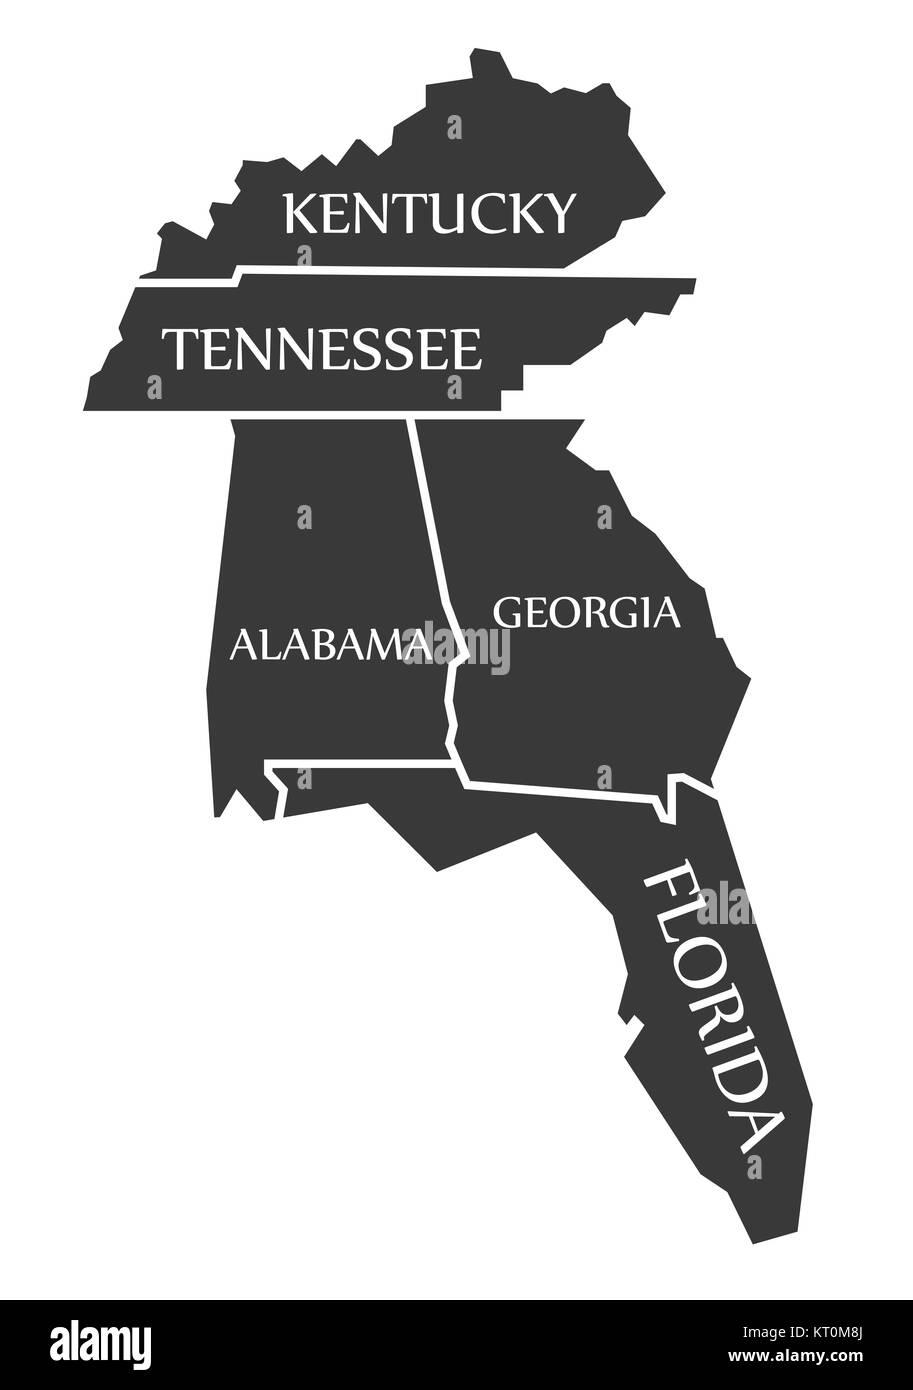 Kentucky - Tennessee - Alabama - Georgia - Florida Map labelled ...